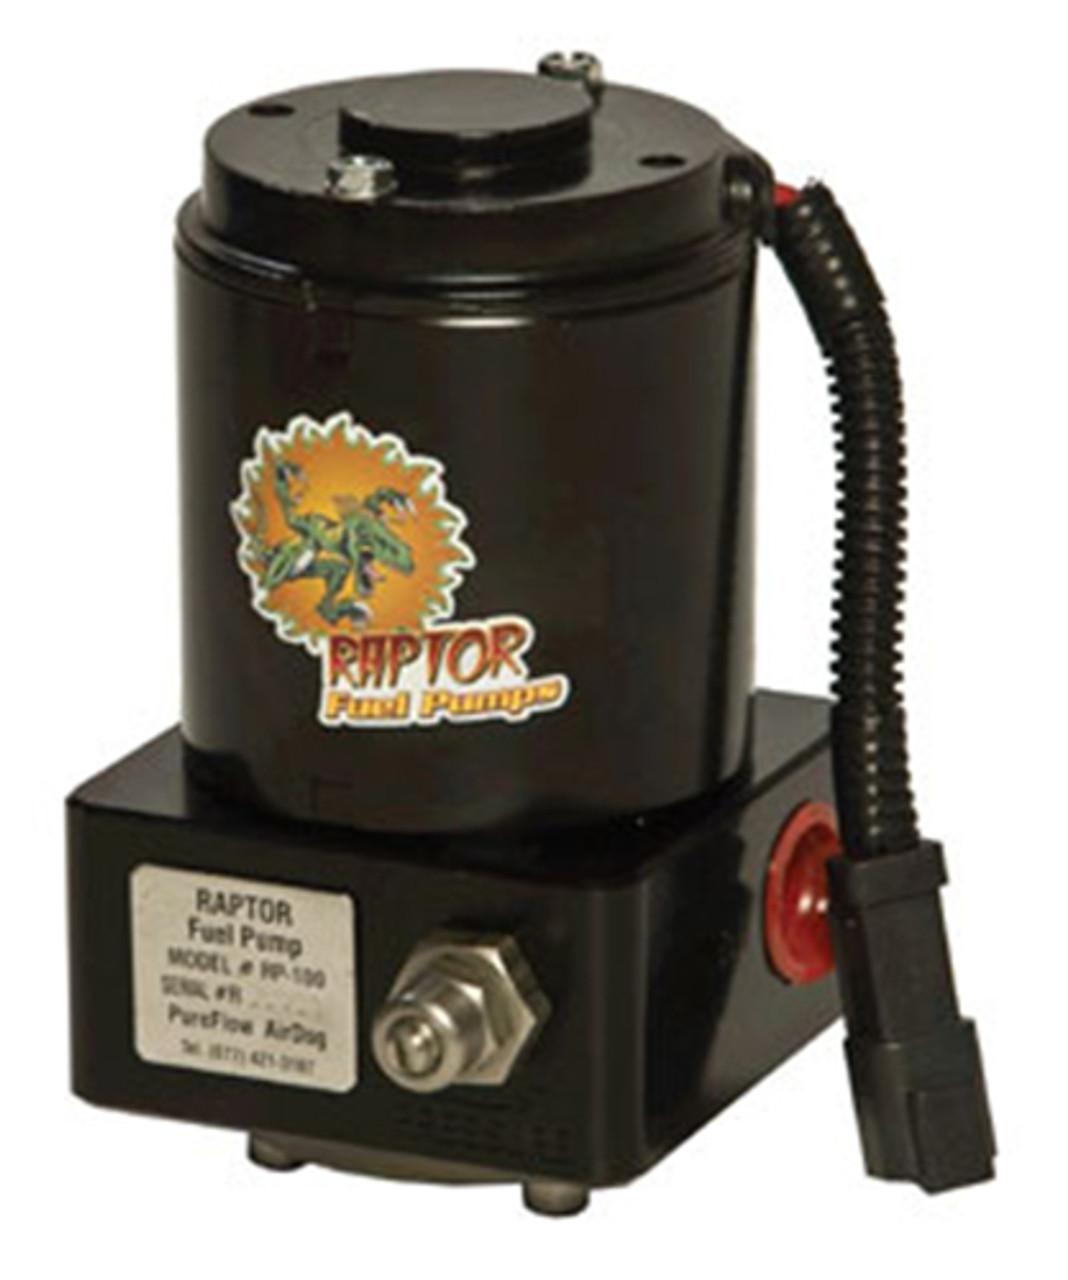 Pureflow/Airdog 2001-09 Chevy Duramax Raptor 100 Hi-Perf Pump Built-In Adj Reg